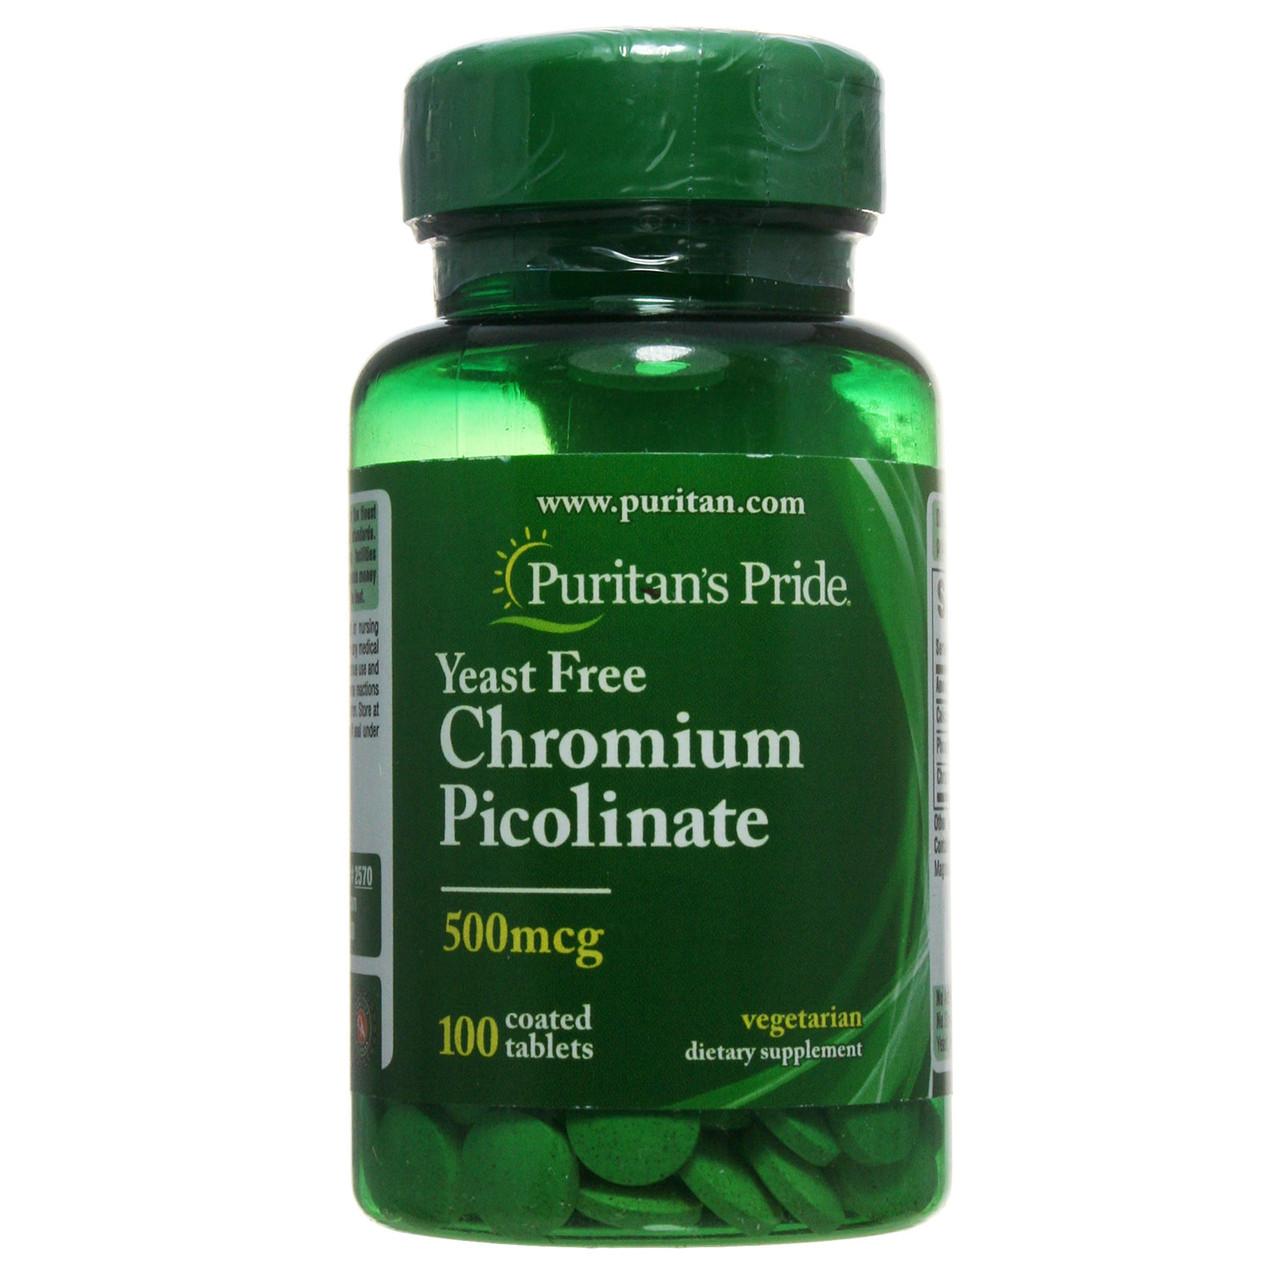 Пиколинат Хрома, Chromium Picolinate 500 mcg, Puritan's Pride, 100 таблеток